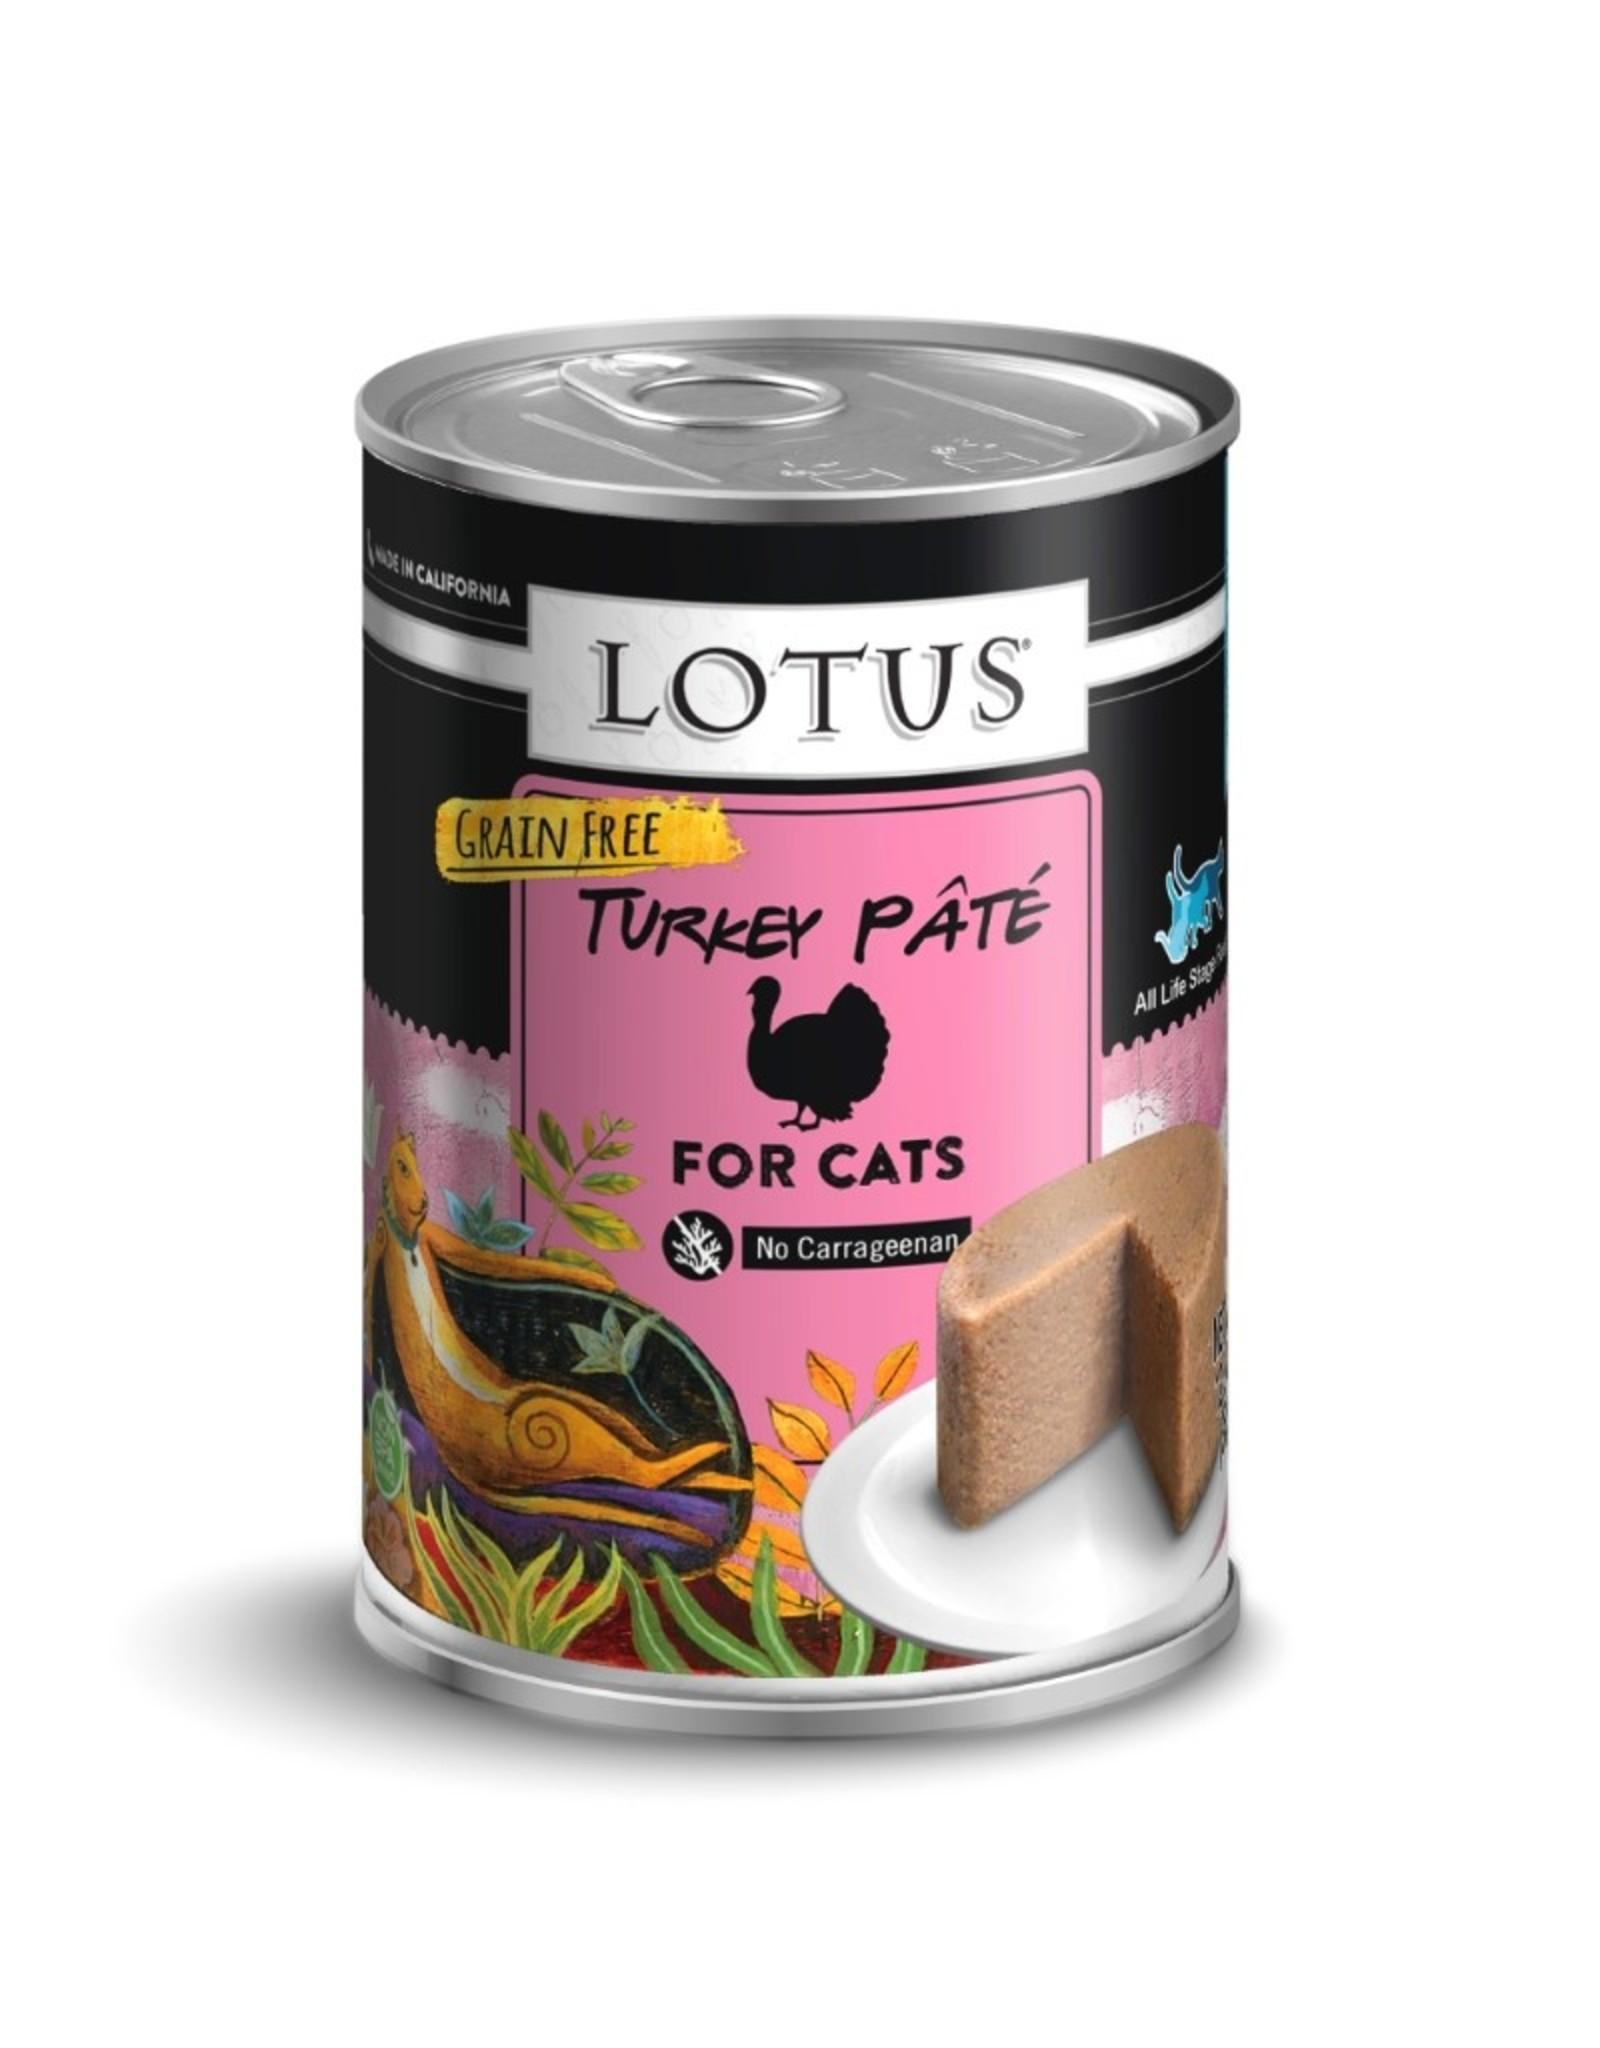 Lotus Pet Food Lotus Pet Food Cat Turkey Pate